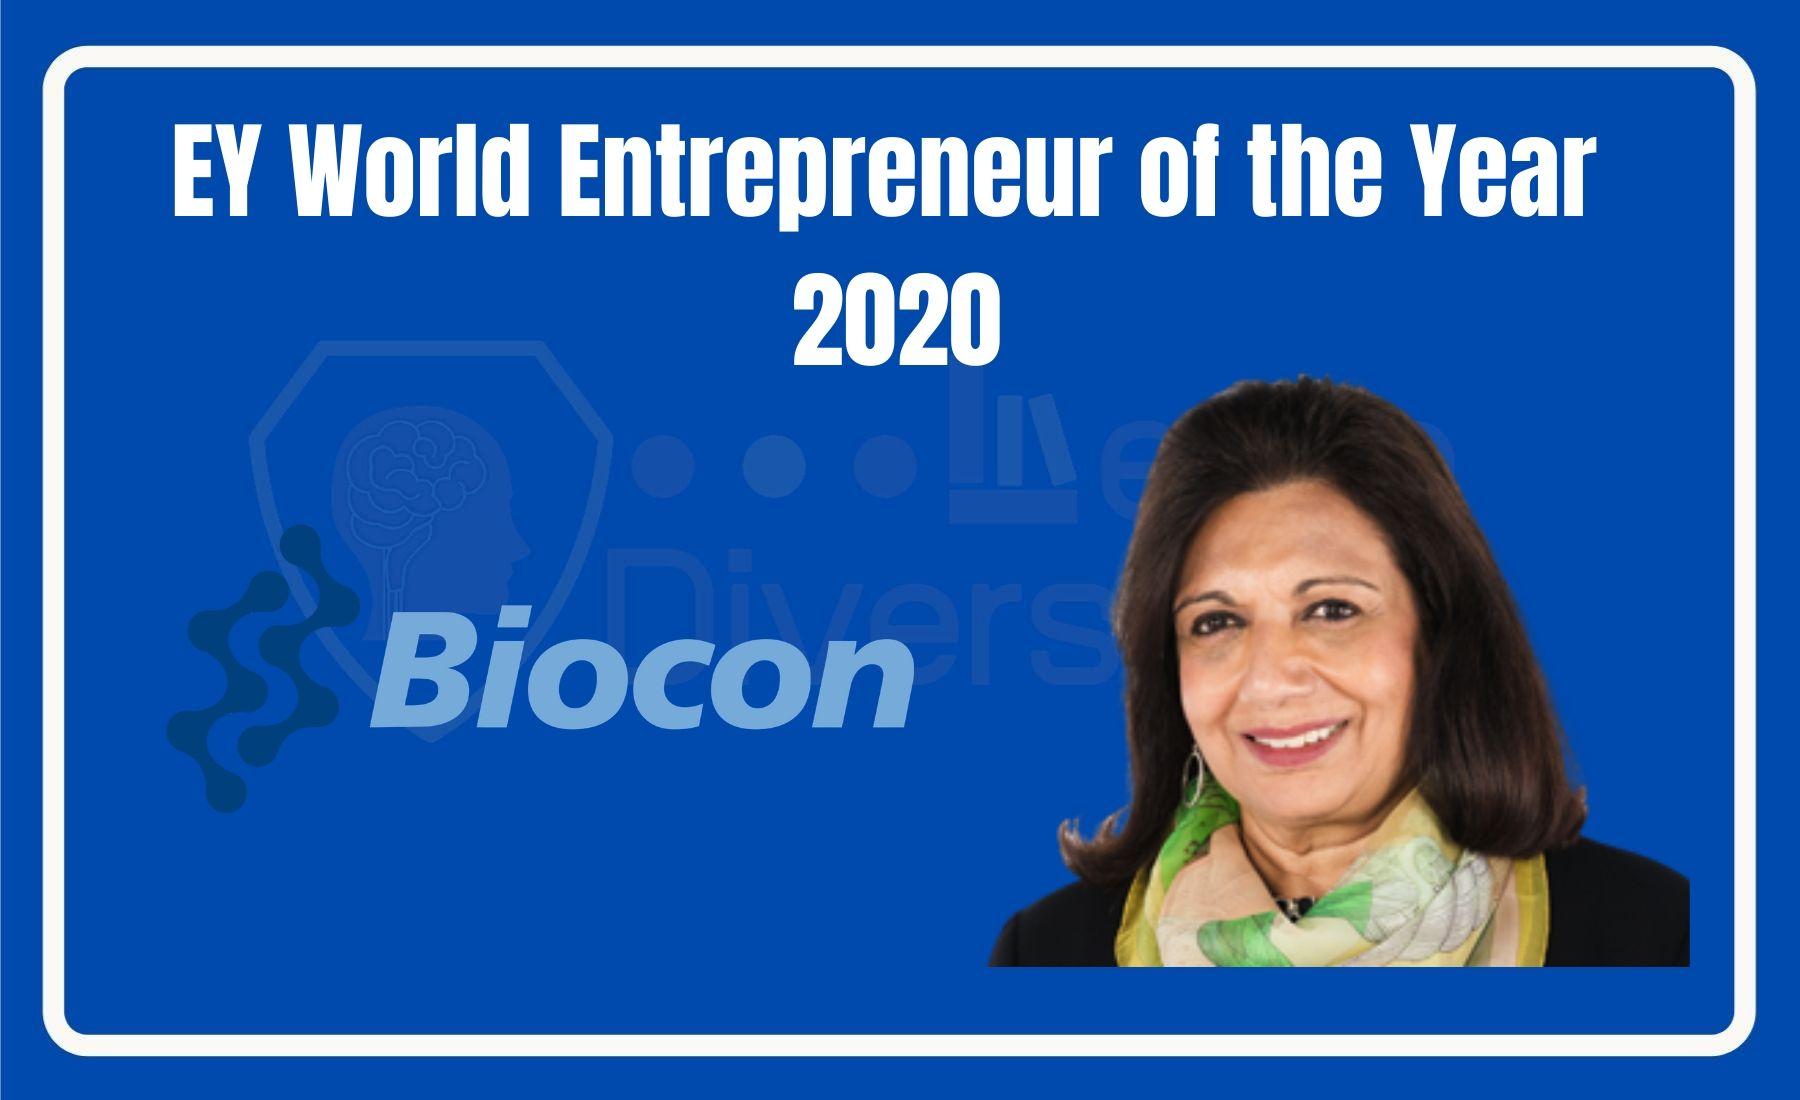 World Entrepreneur